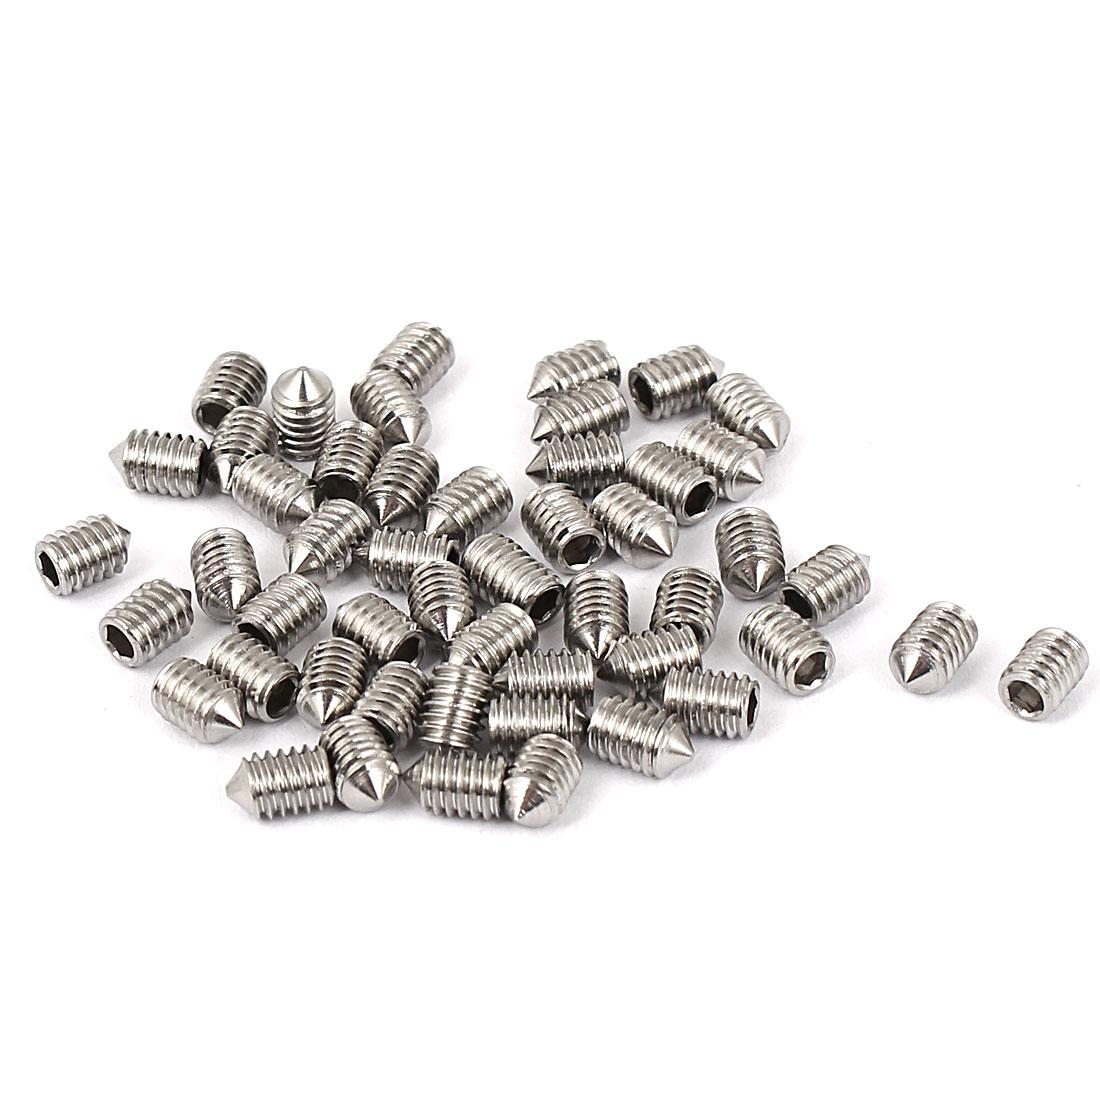 M4 x 6mm Cone Point Hex Socket Set Grub Screw Silver Tone 50 Pcs